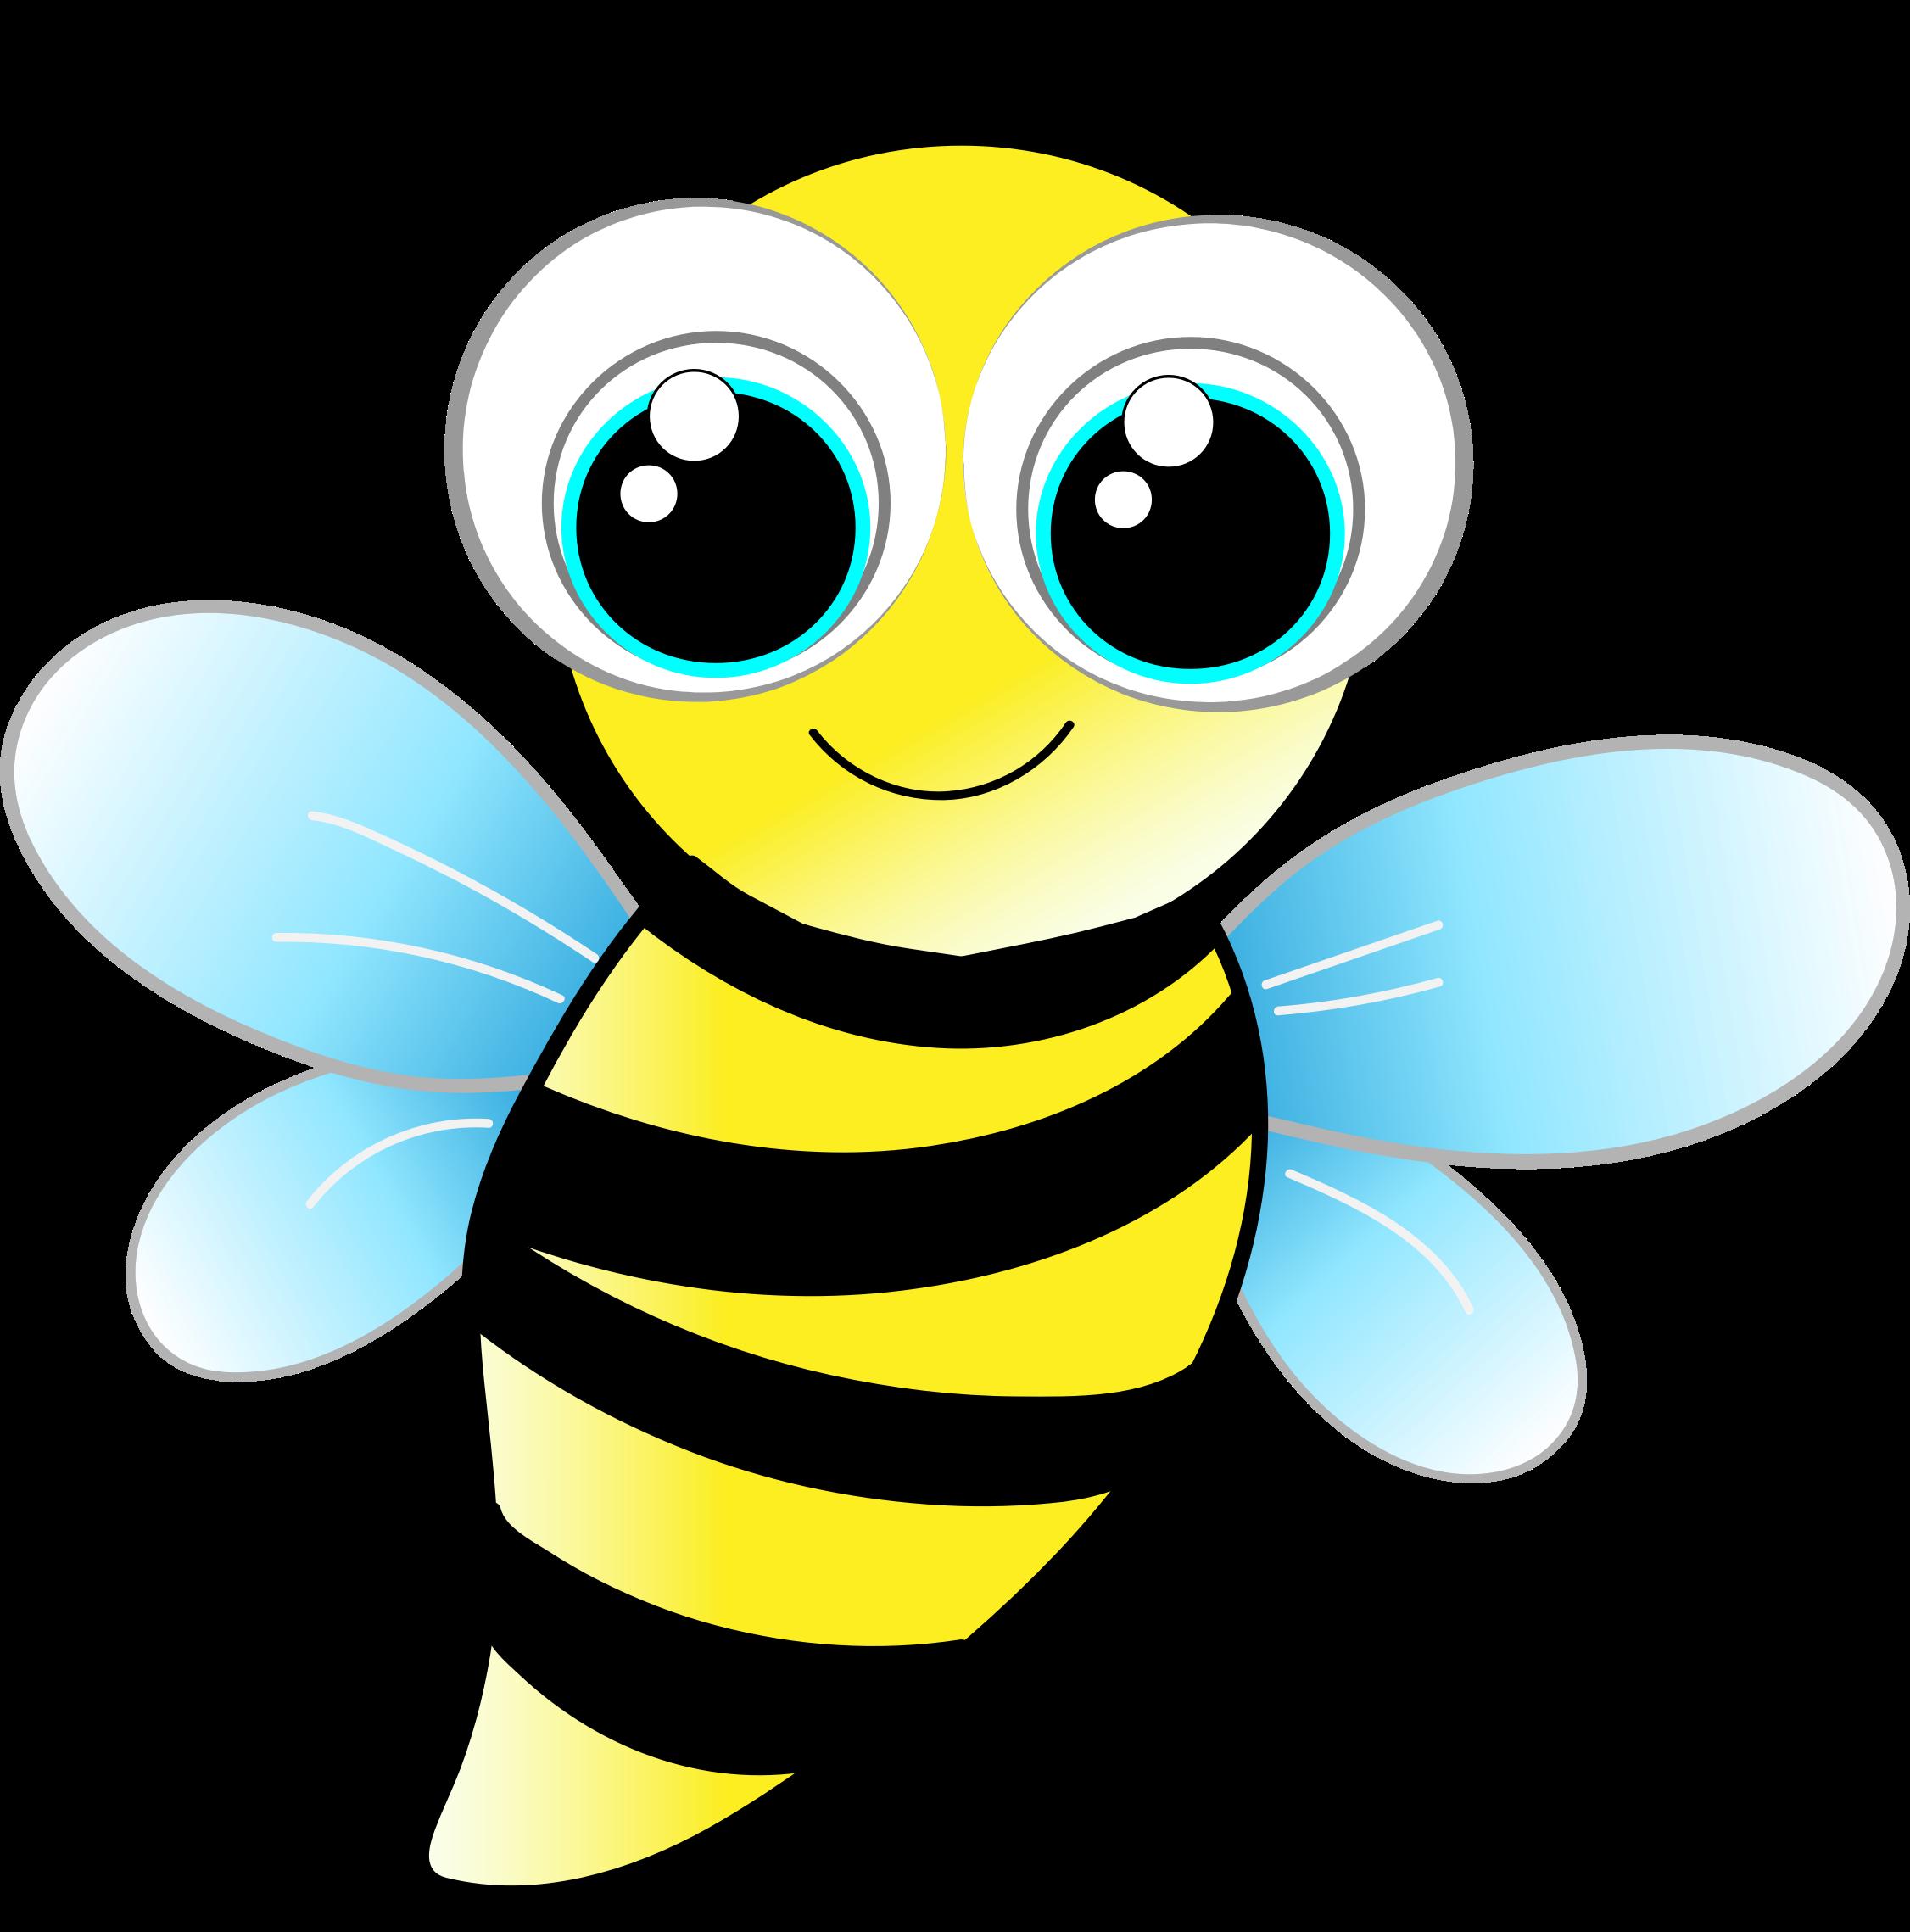 Friendly bee by gdj. Inchworm clipart caterpillar baby